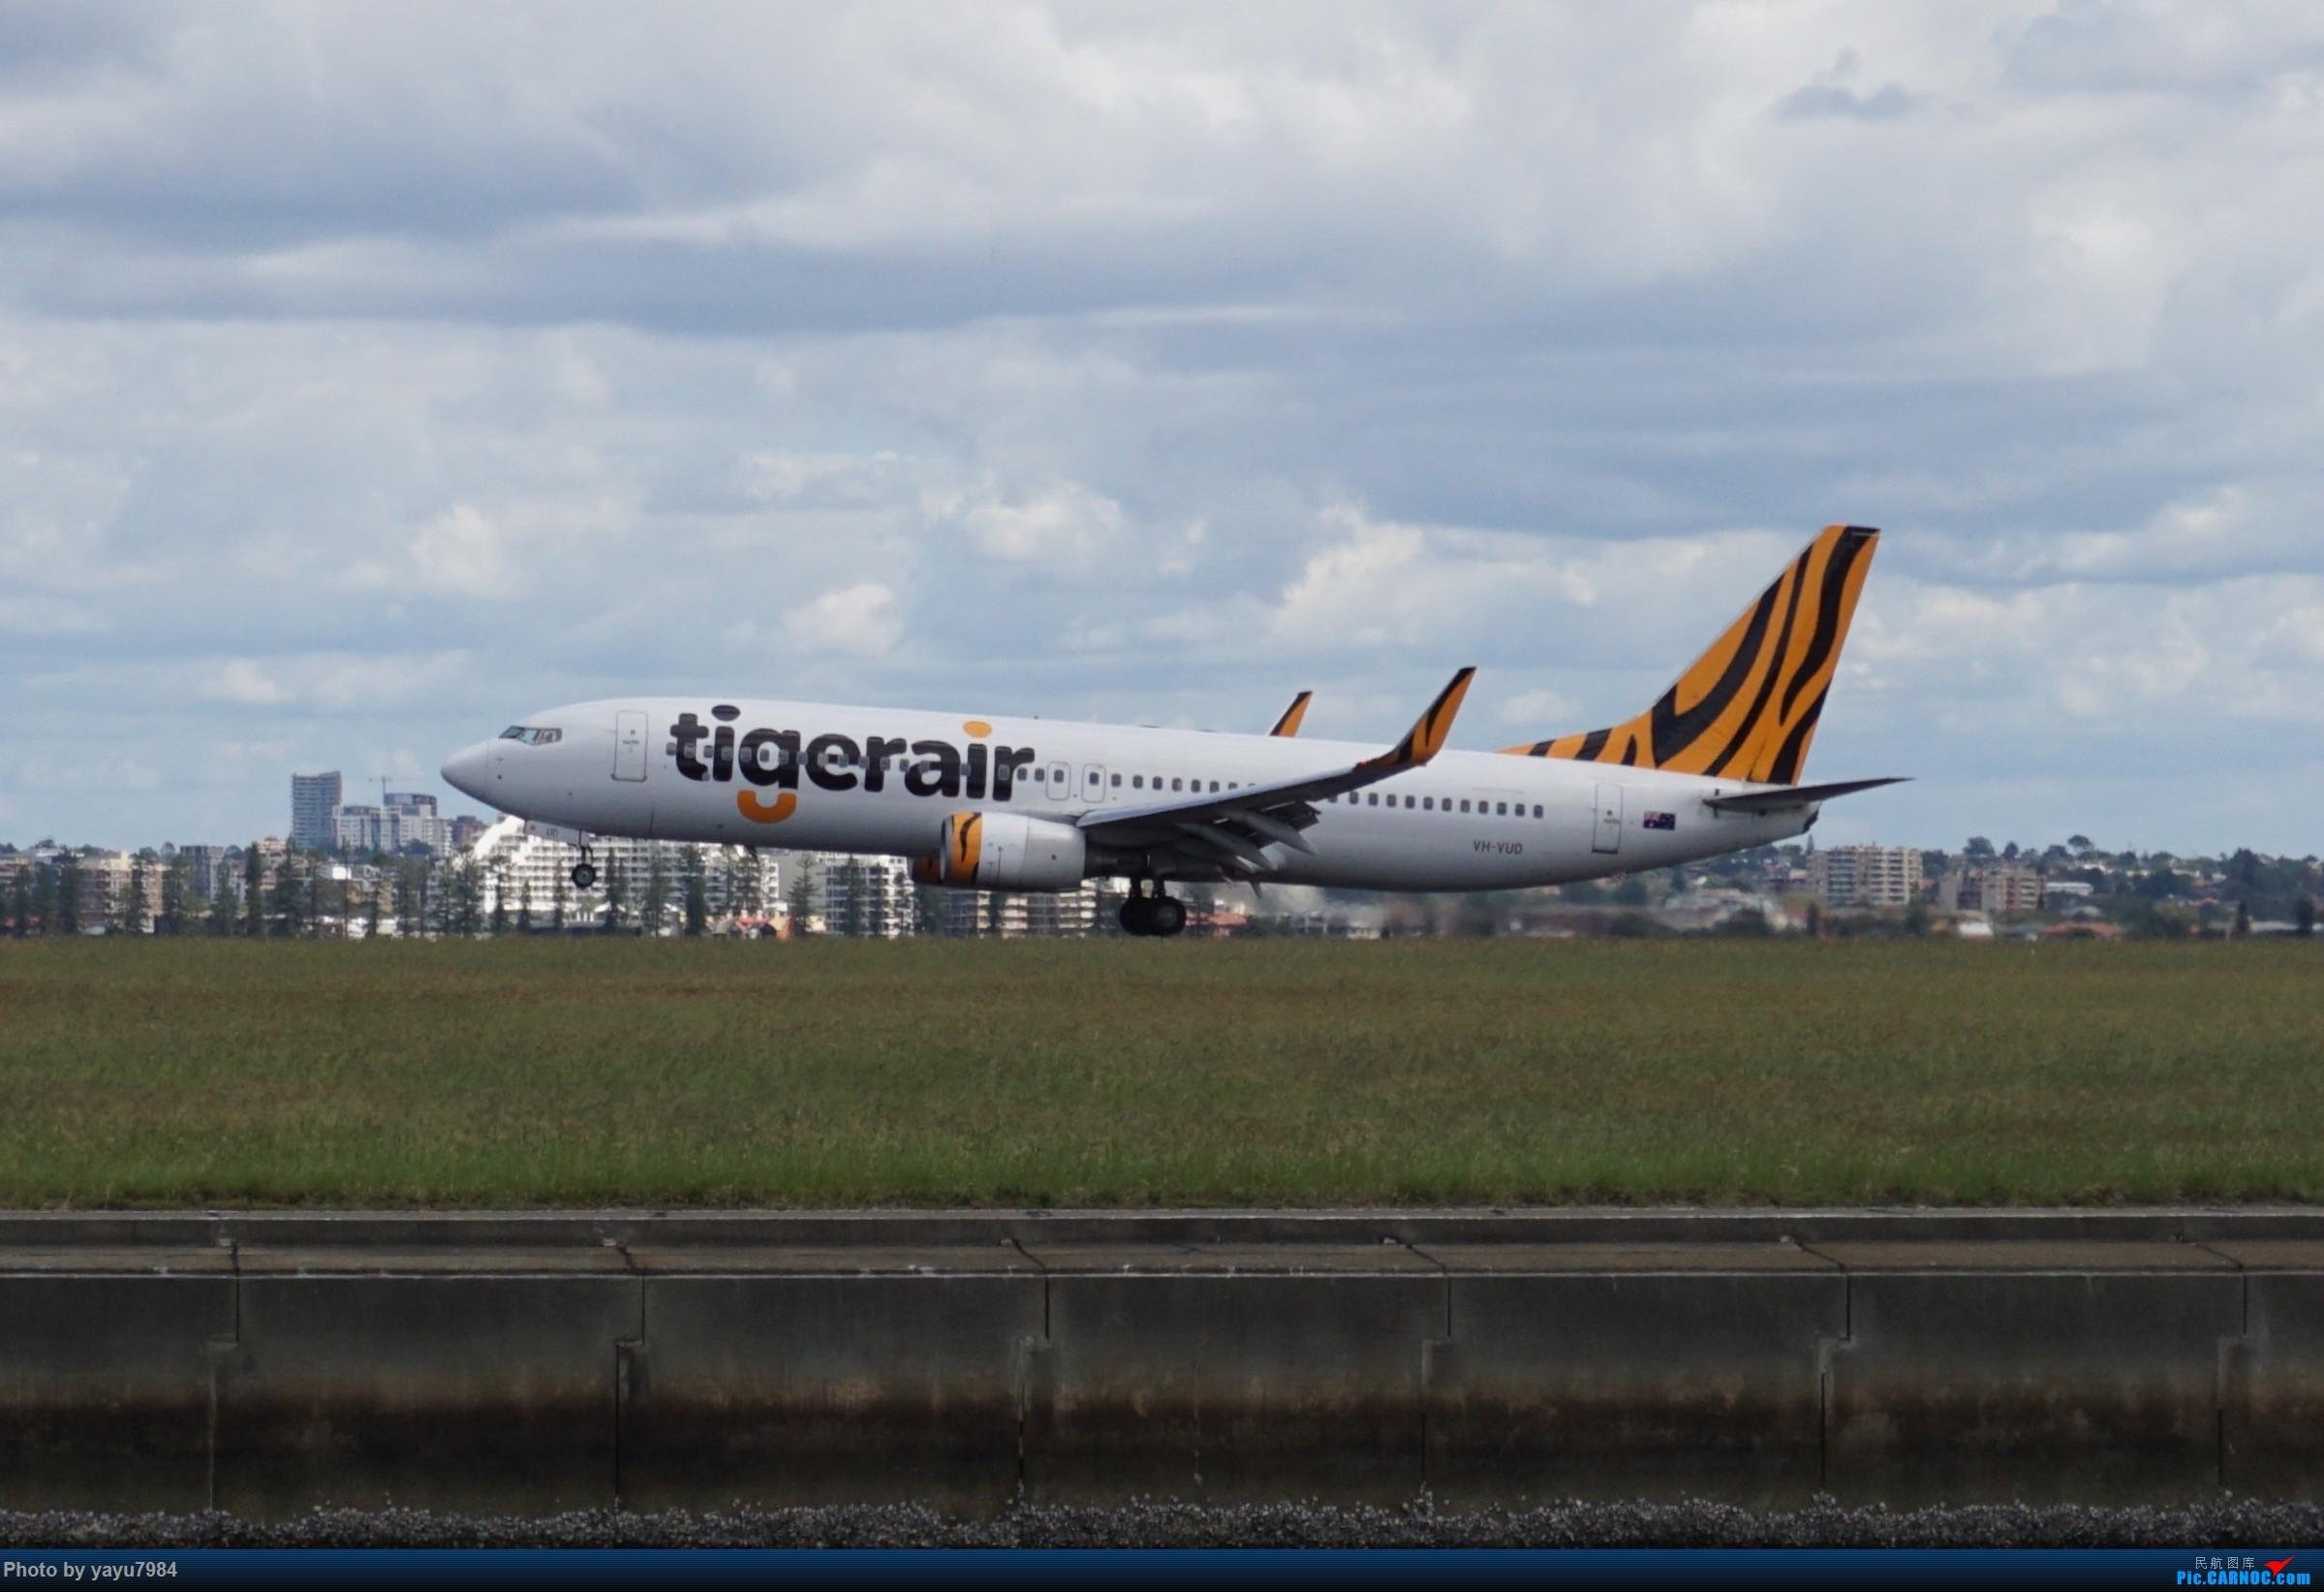 Re:[原创][SYD] 开帖分享一下16L/34R,以及07/25跑道周边的新拍机点位 BOEING 737-800 VH-VUD 澳大利亚悉尼金斯福德·史密斯机场